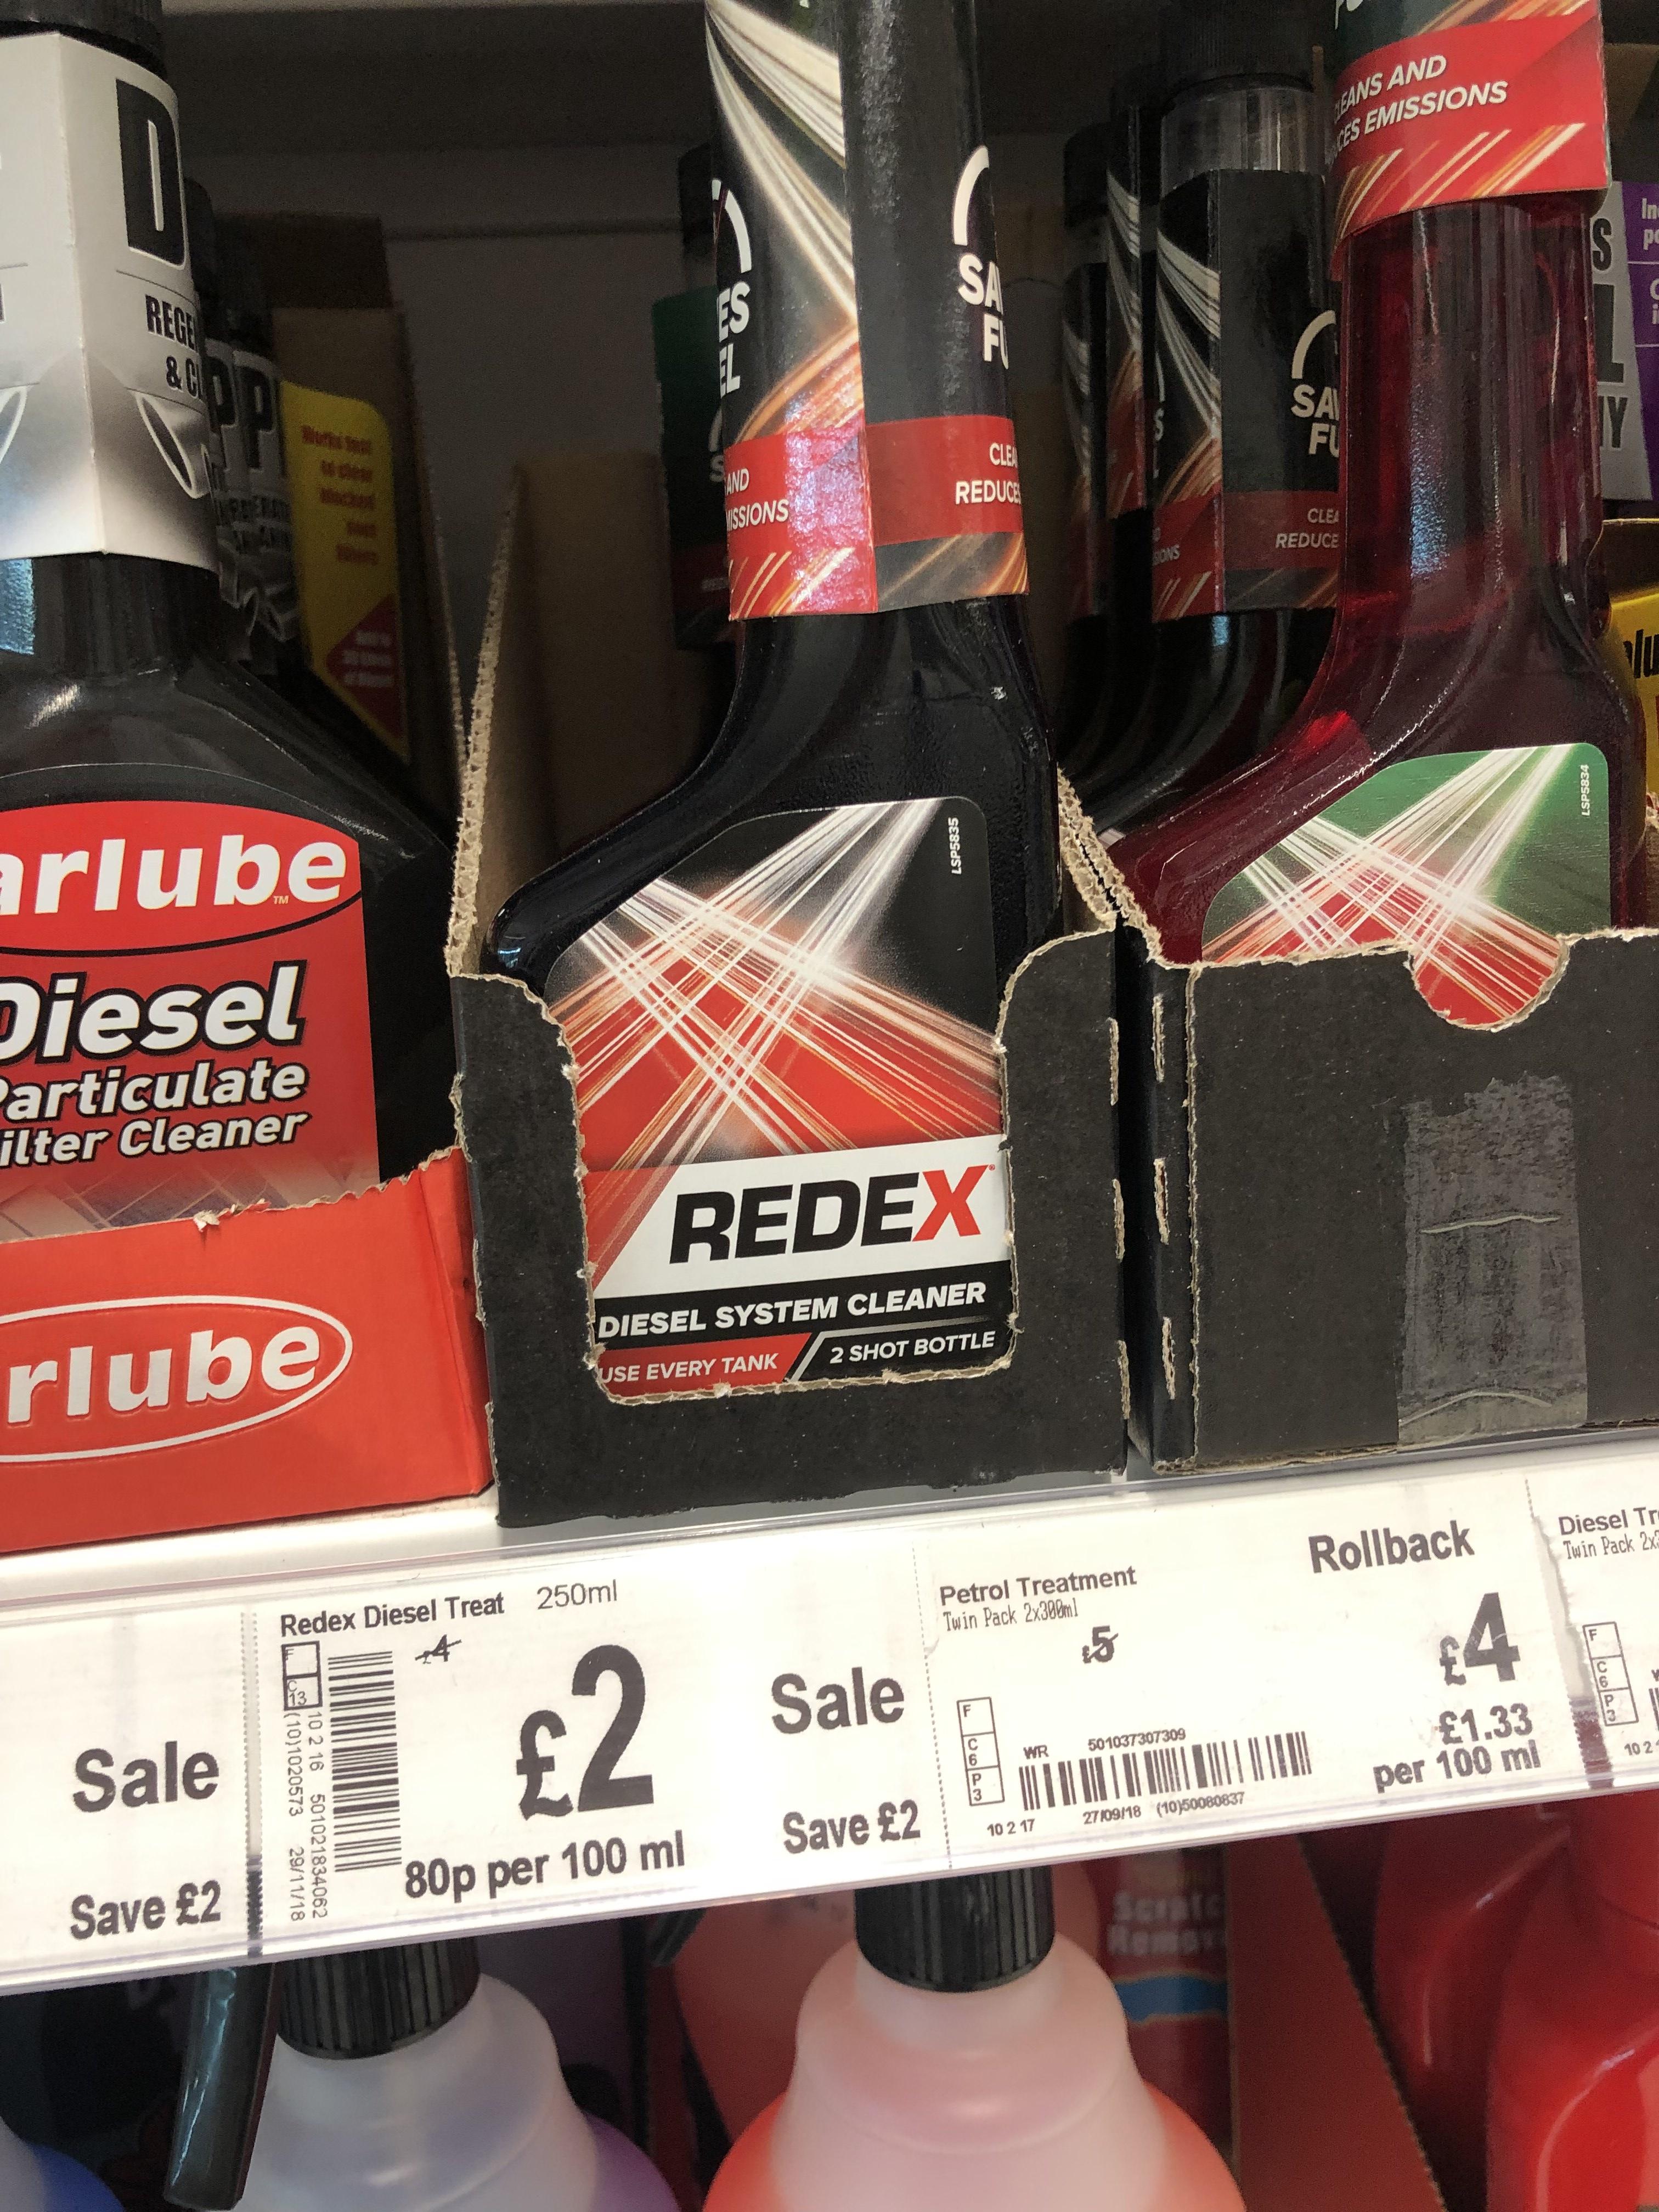 Redex diesel system cleaner instore ay Asda for £2